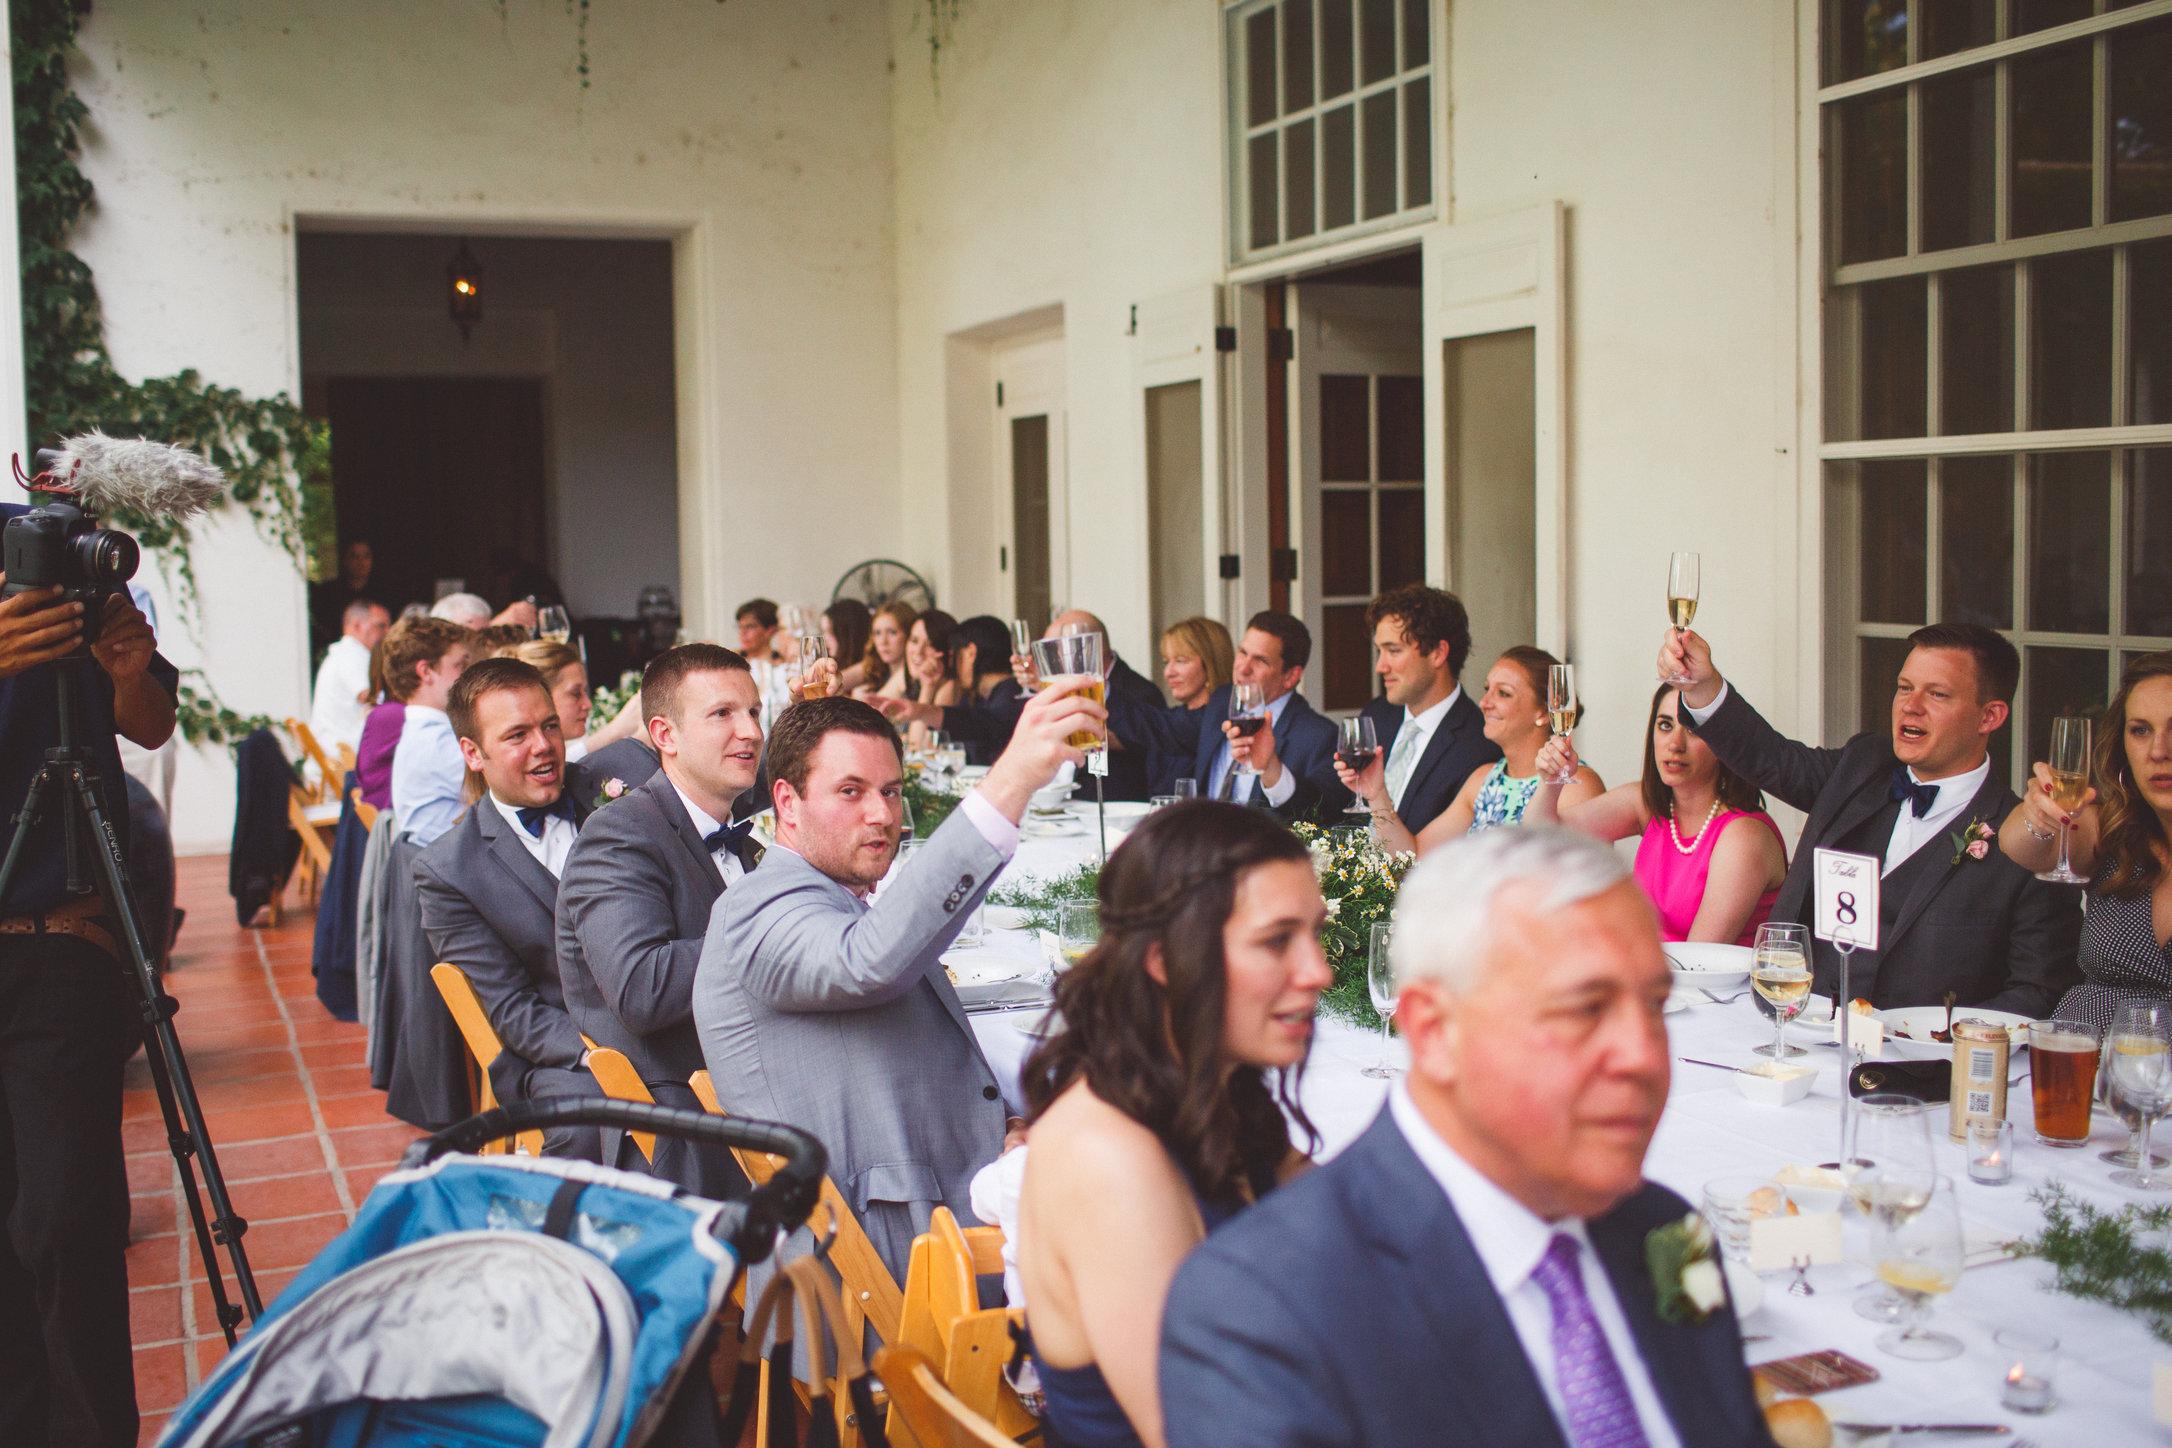 SandC-wedding-521.jpg